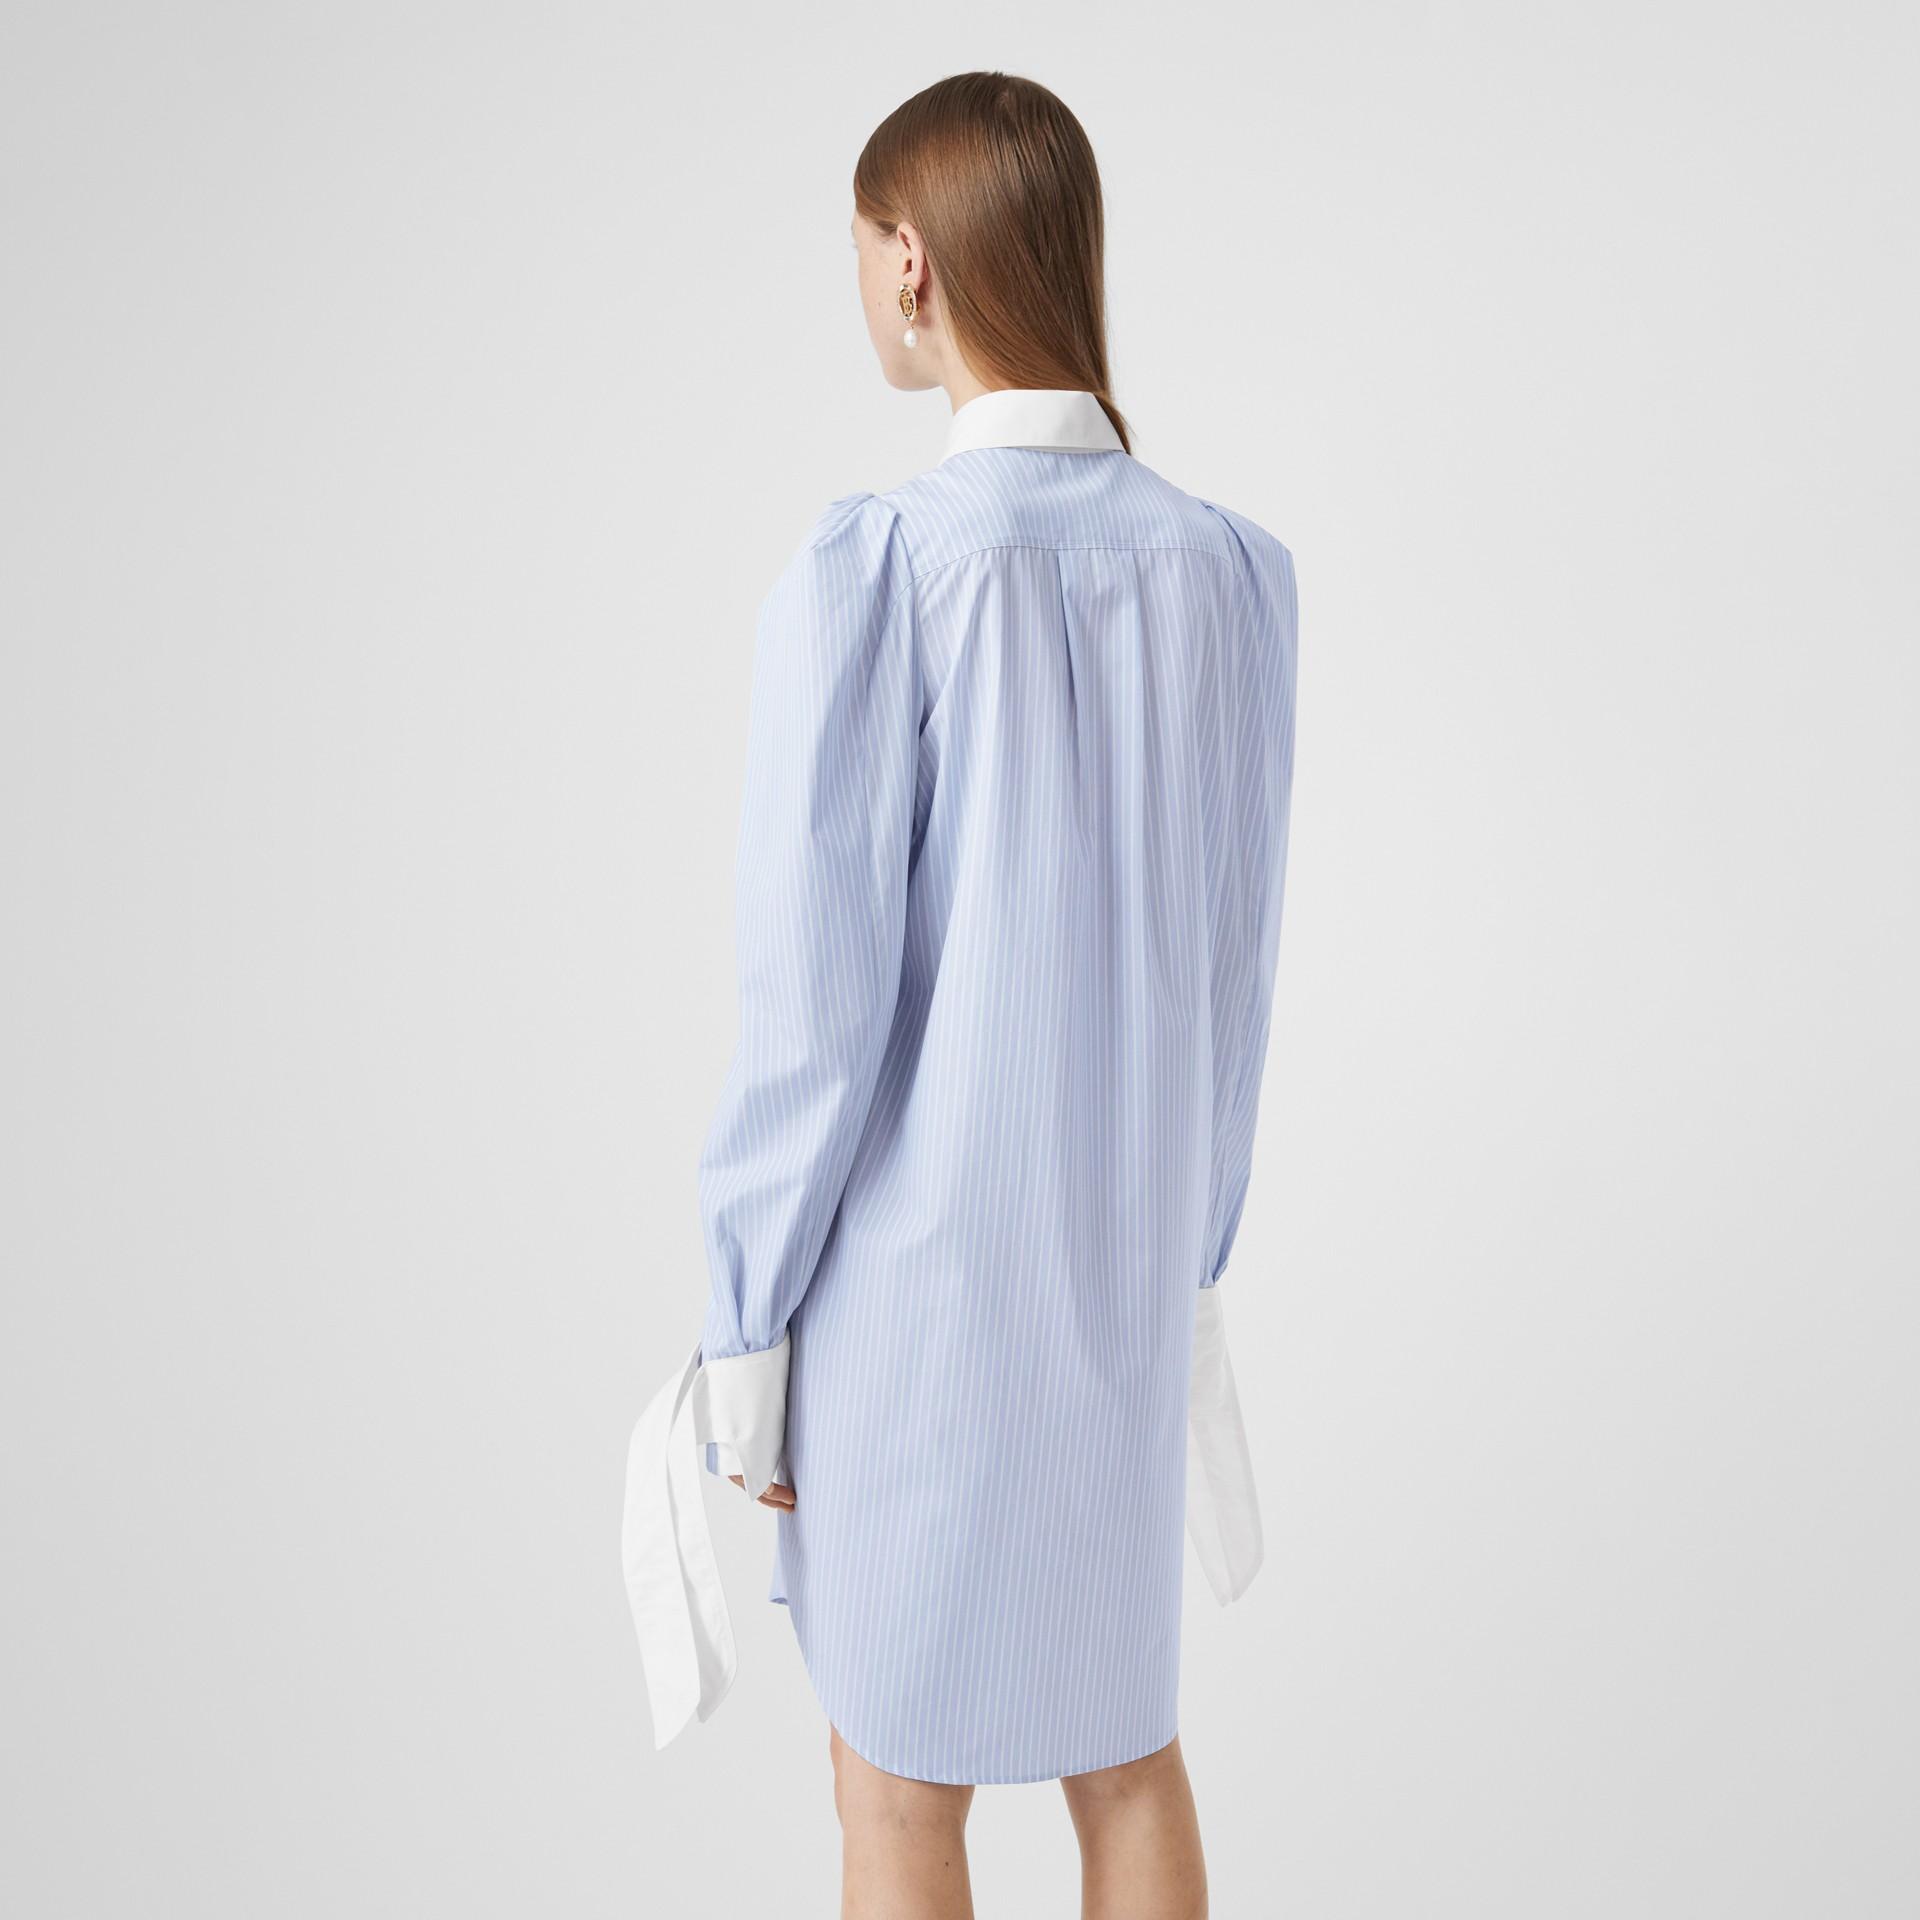 Striped Cotton Poplin Shirt Dress in Pale Blue - Women | Burberry - gallery image 2